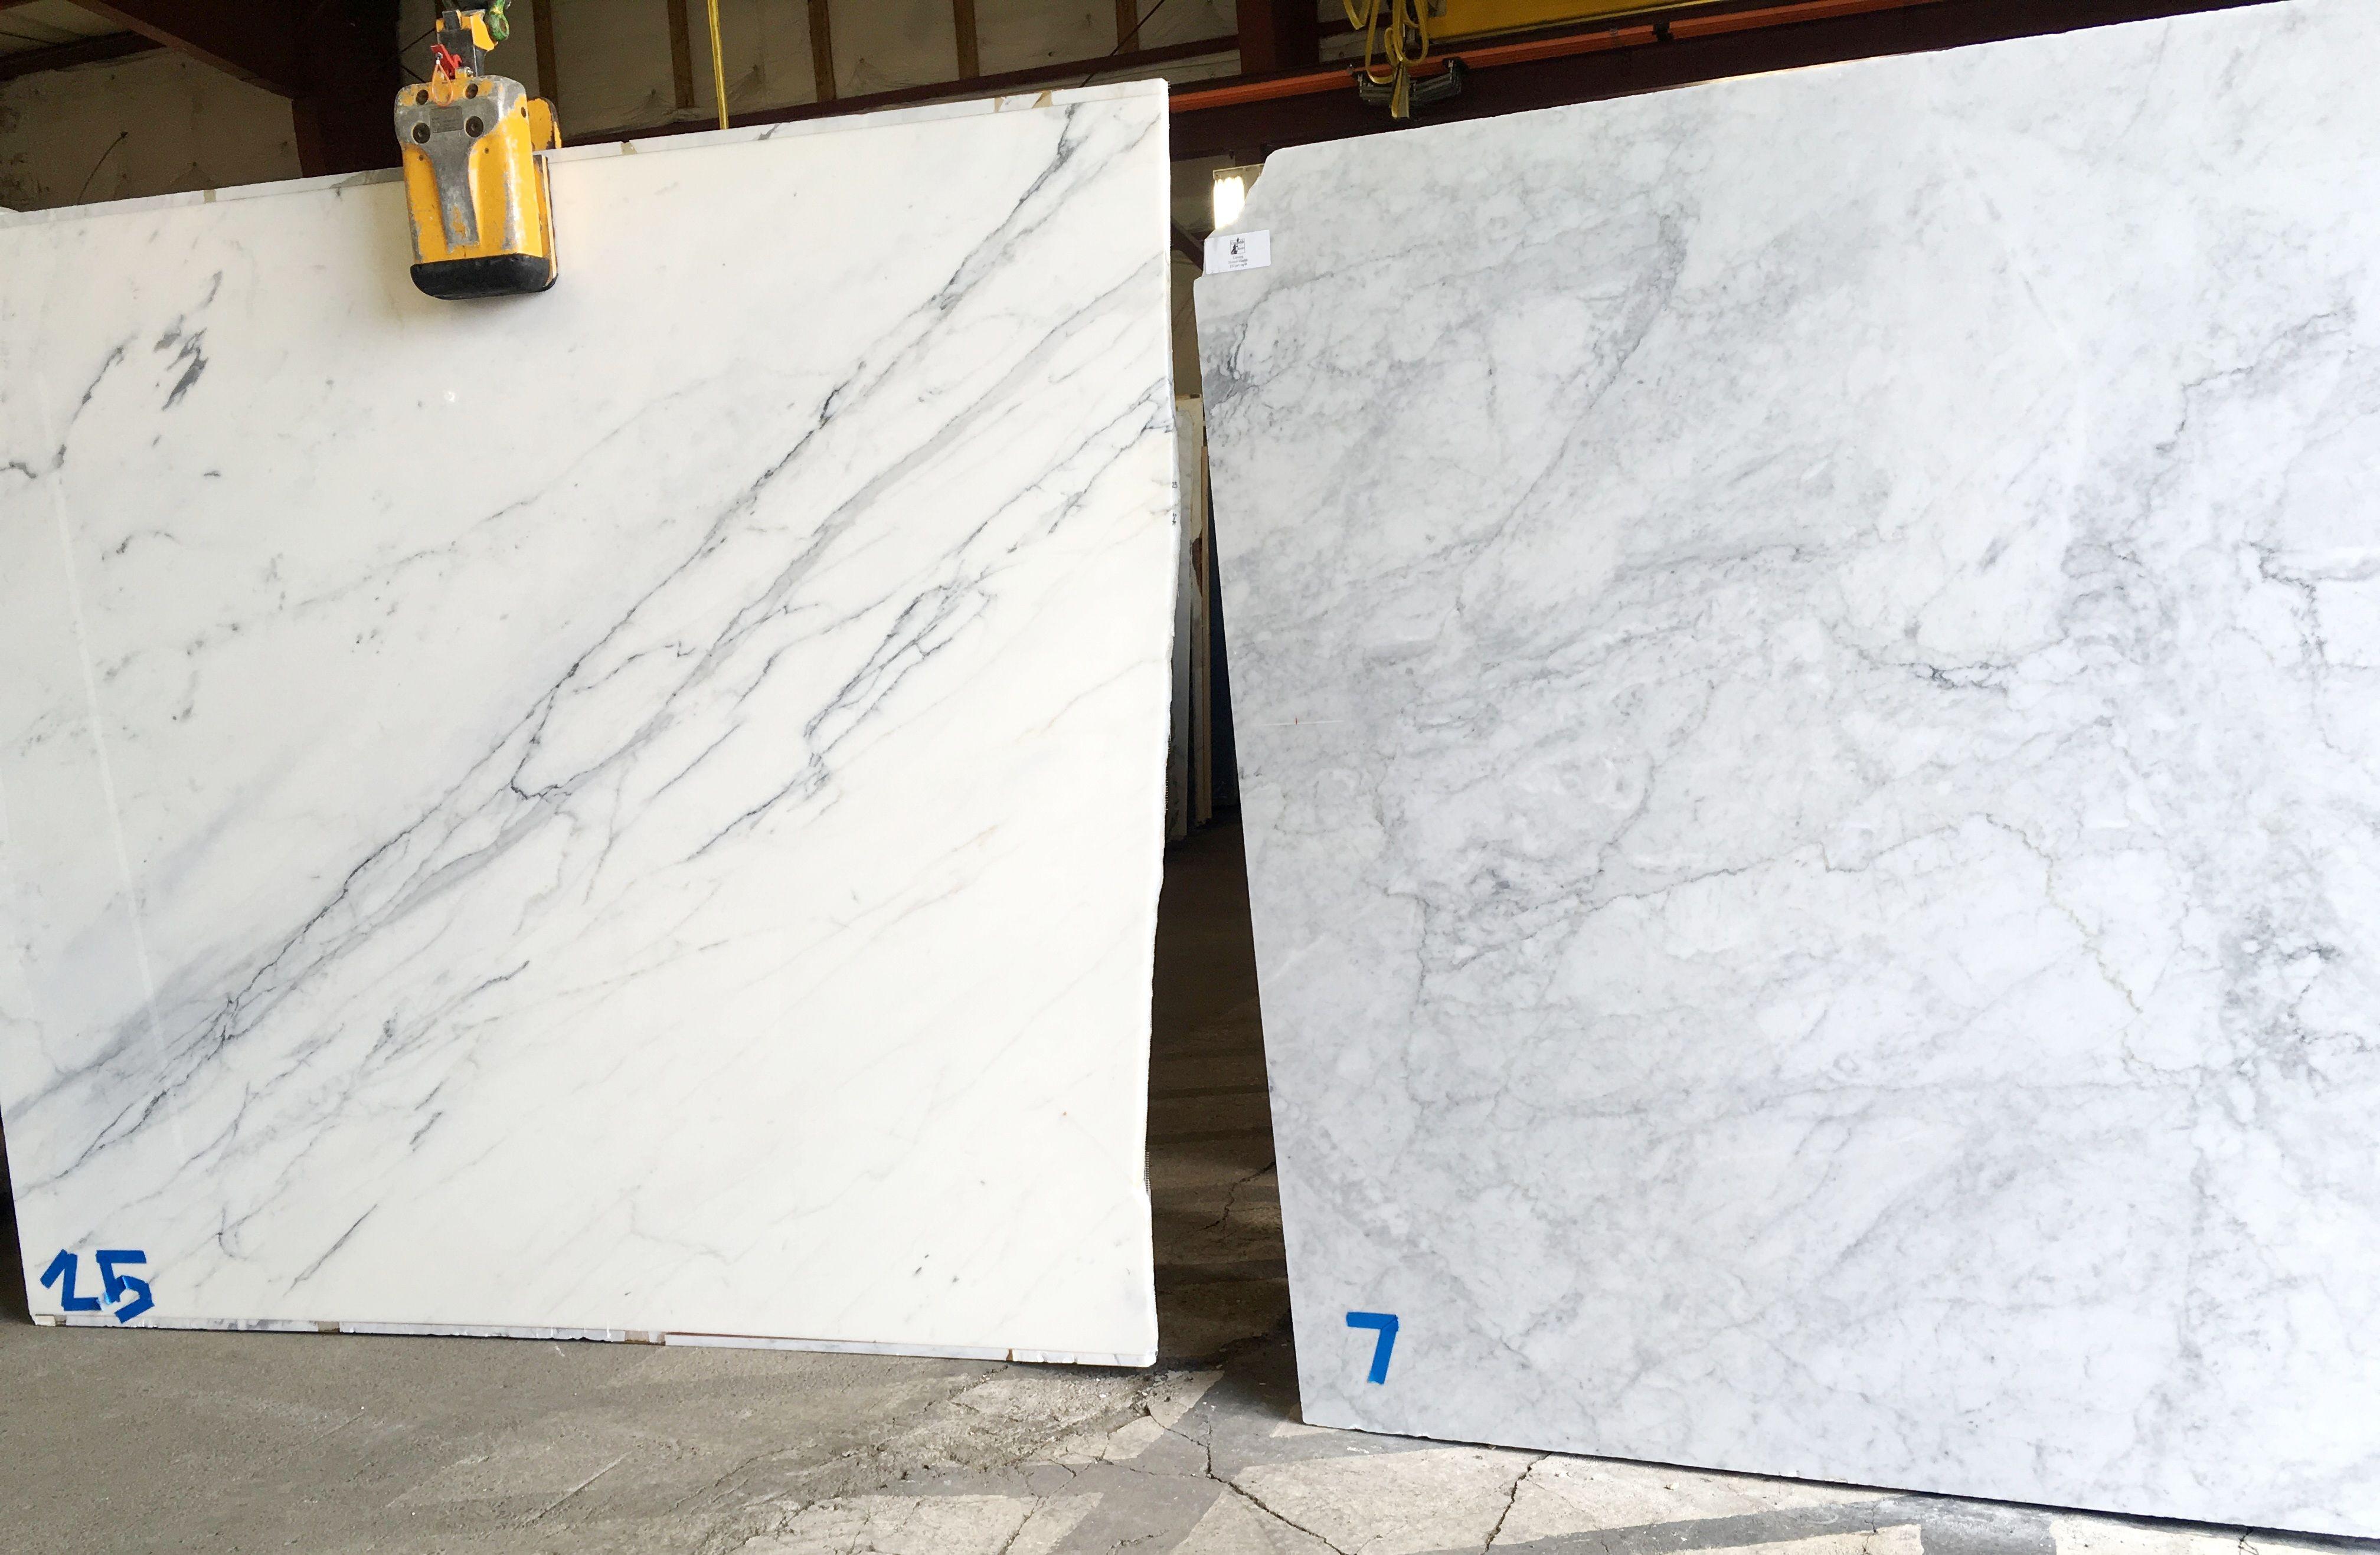 Calacatta Compared To Carrara Marble Both Italian Marbles Marble Slab Marble Backsplash Marble Countertops